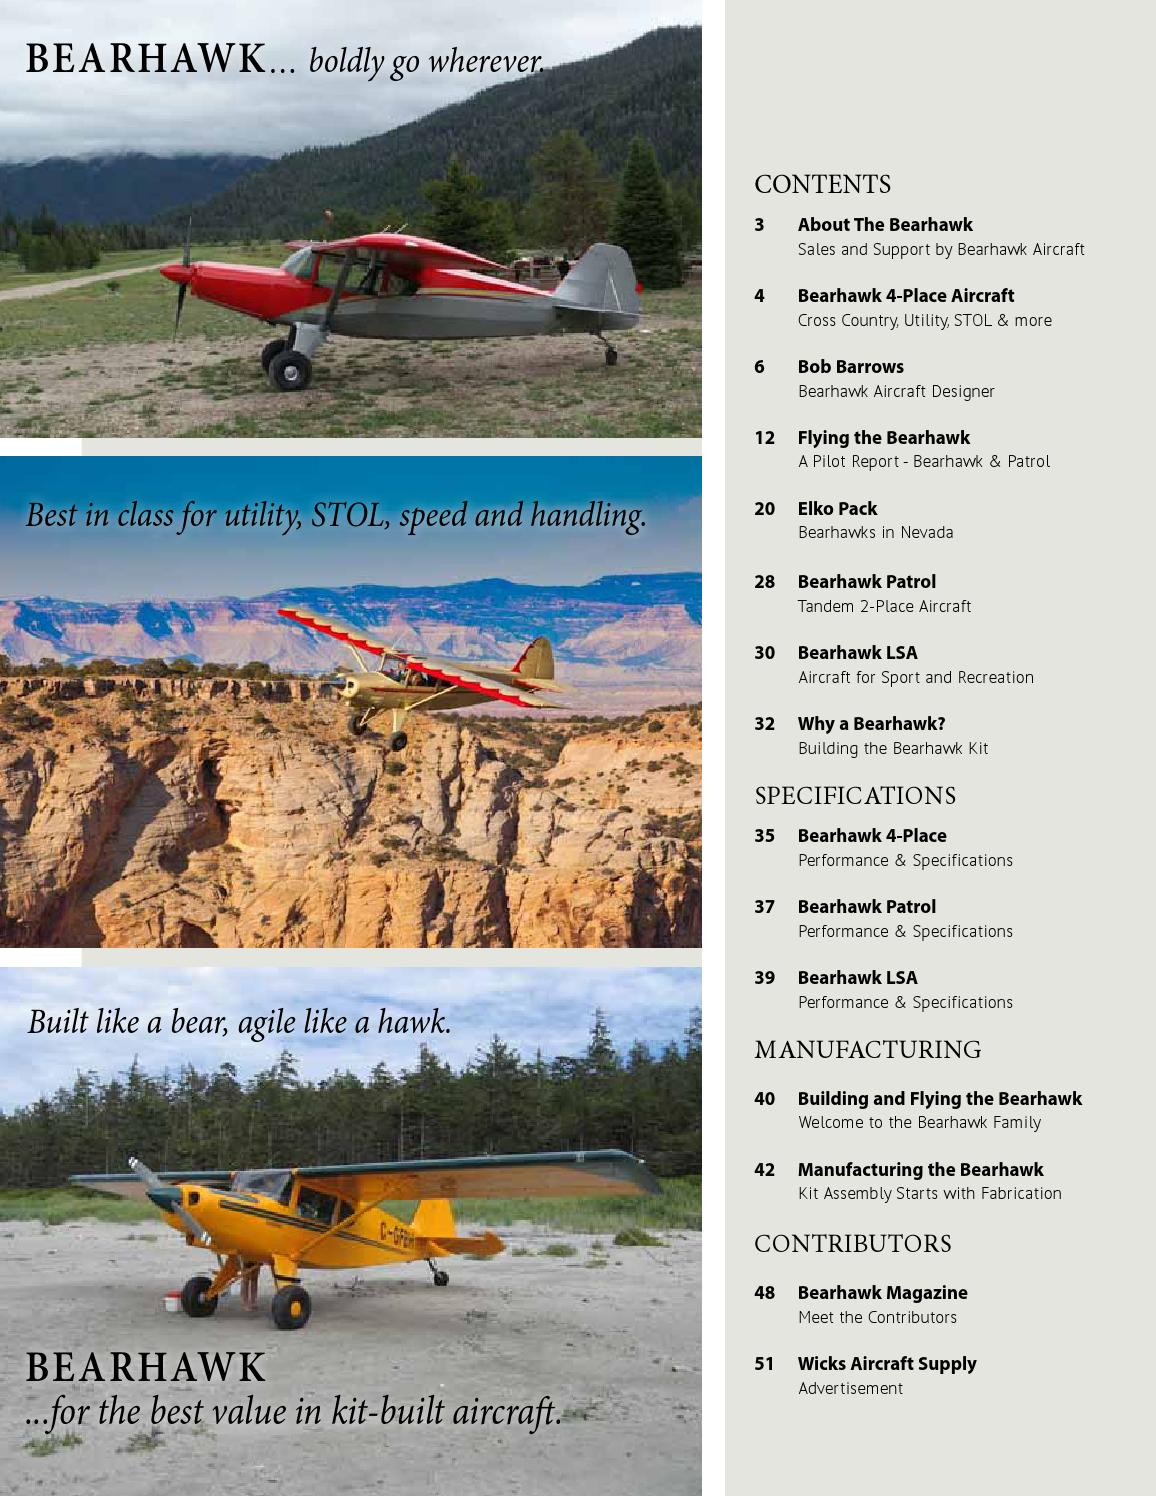 Bearhawk Magazine - April 2015 by m t - issuu